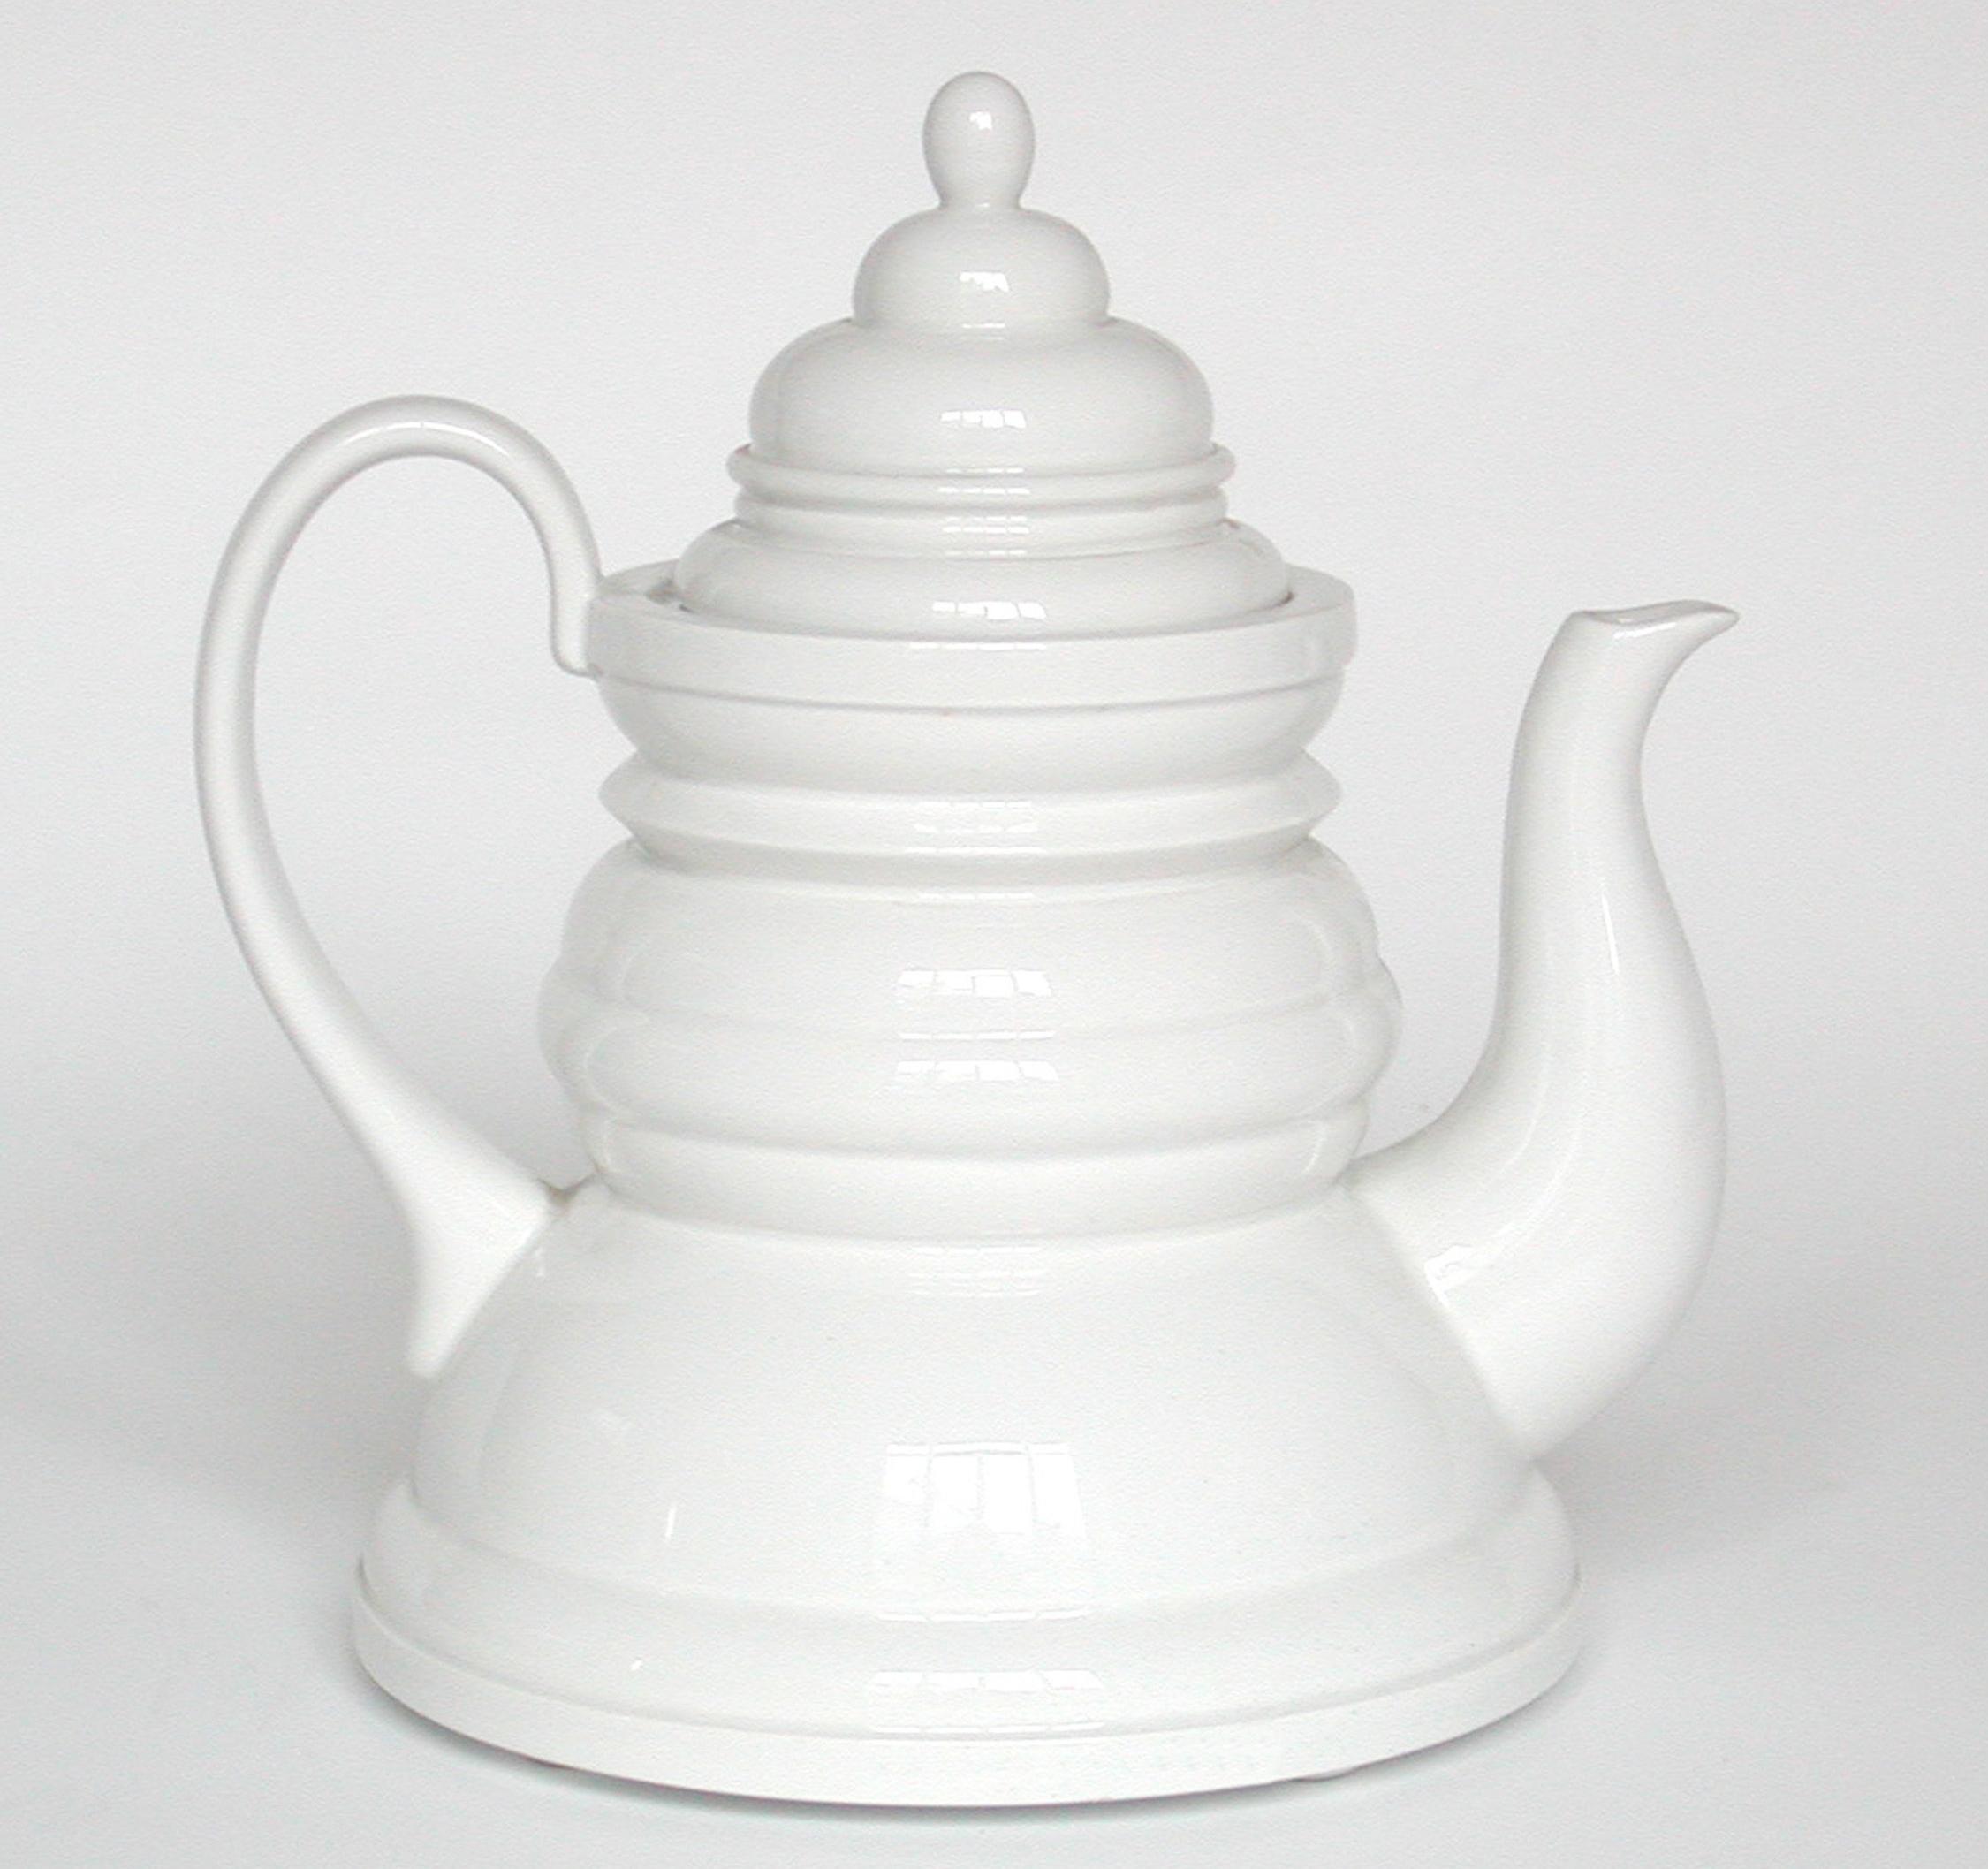 SarriCeramiche_1994_teapot004.jpg